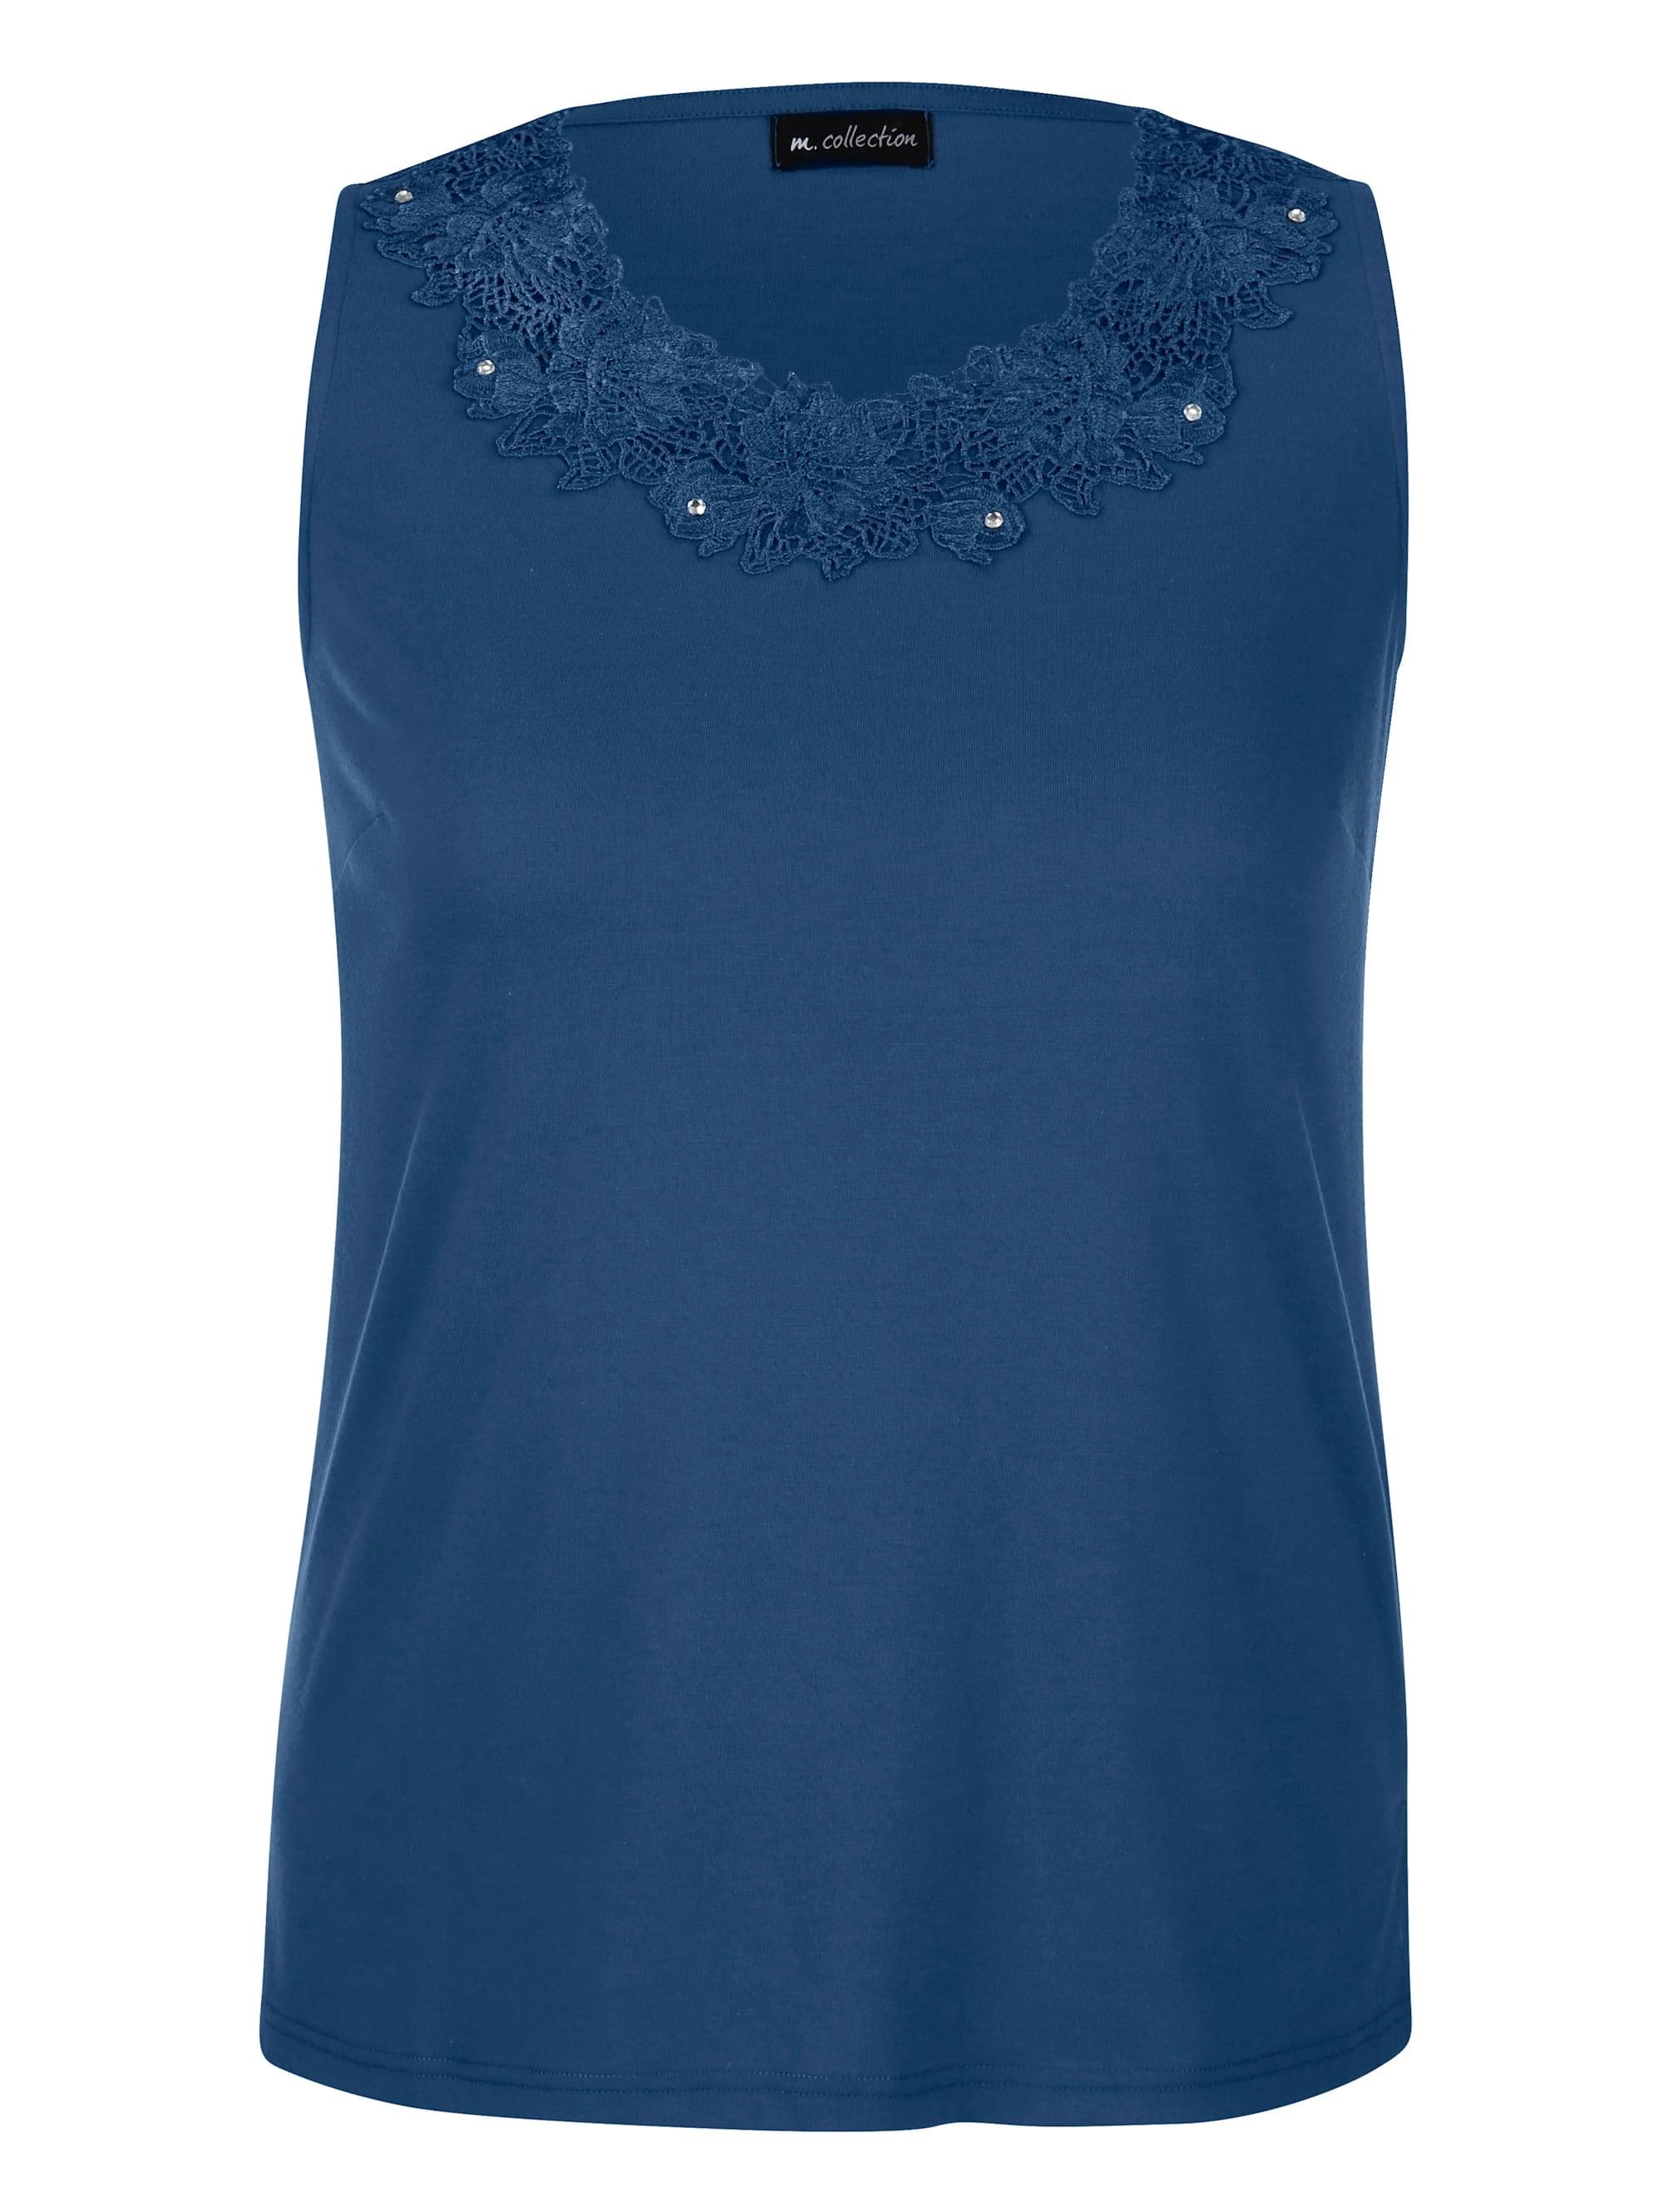 m. collection Spitzentop, mit schöner Spitze blau Damen Spitzentops Tops Spitzentop